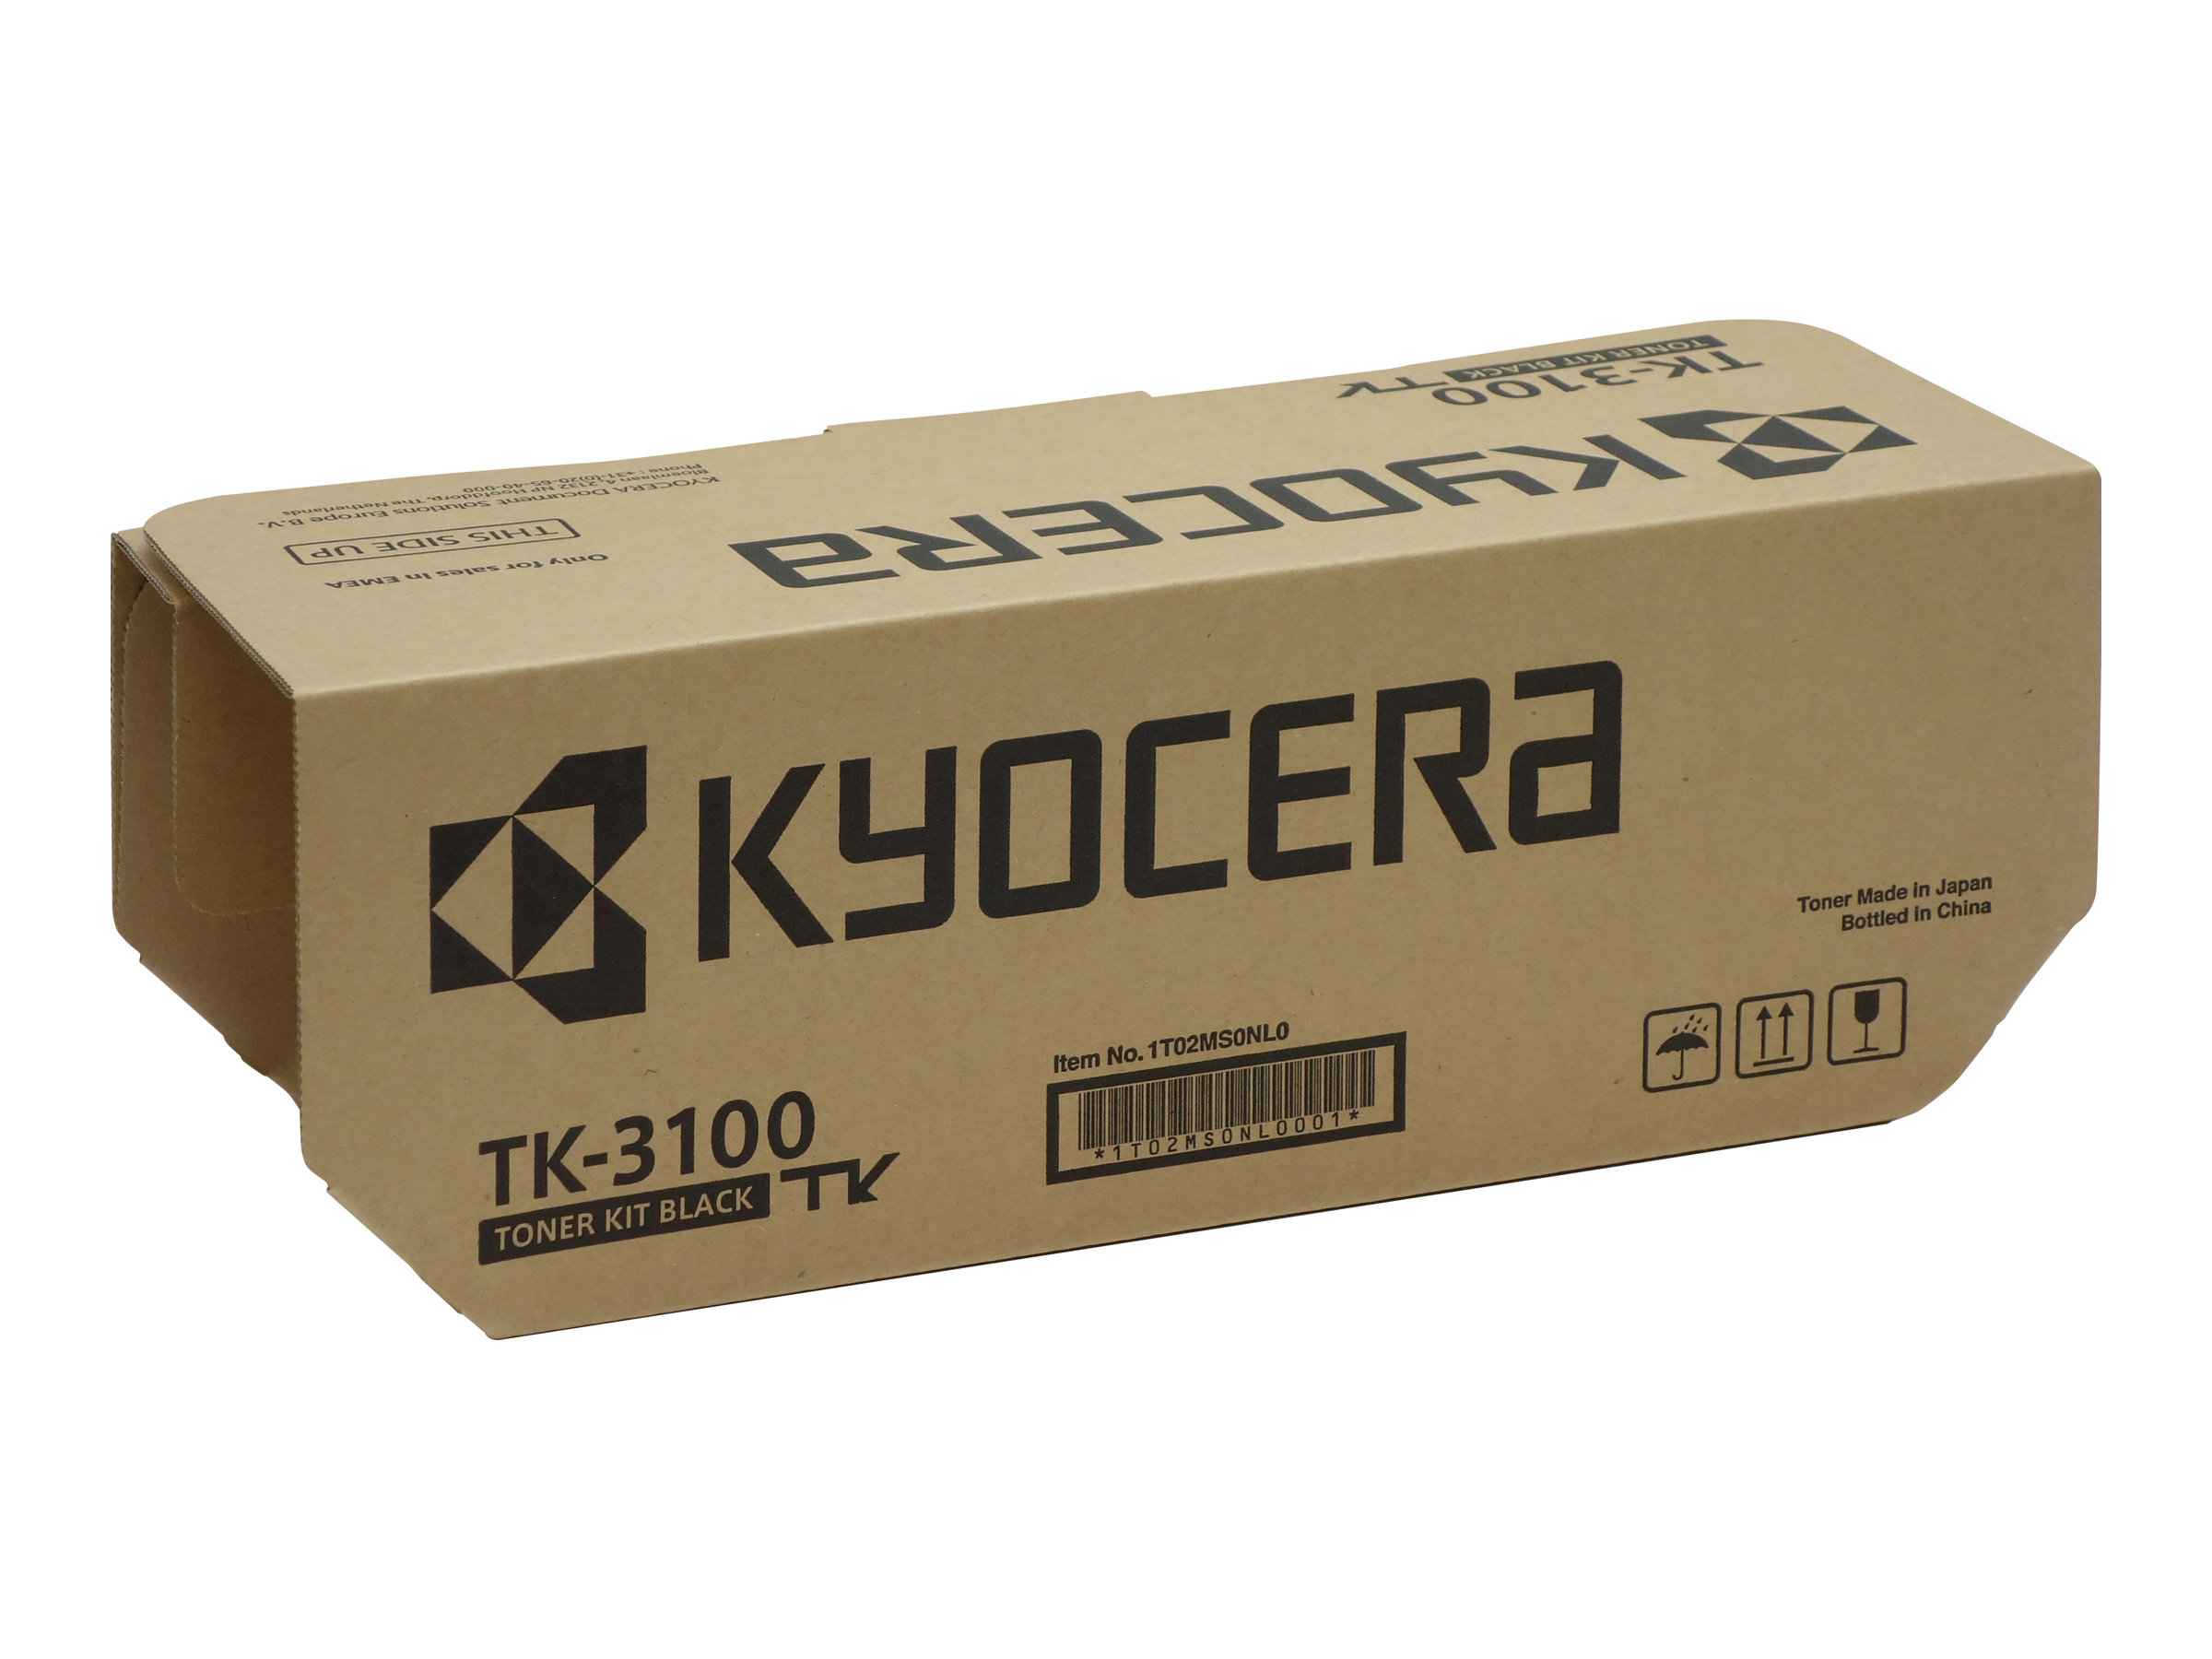 Kyocera TK 3100 - Schwarz - Original - Tonerpatrone